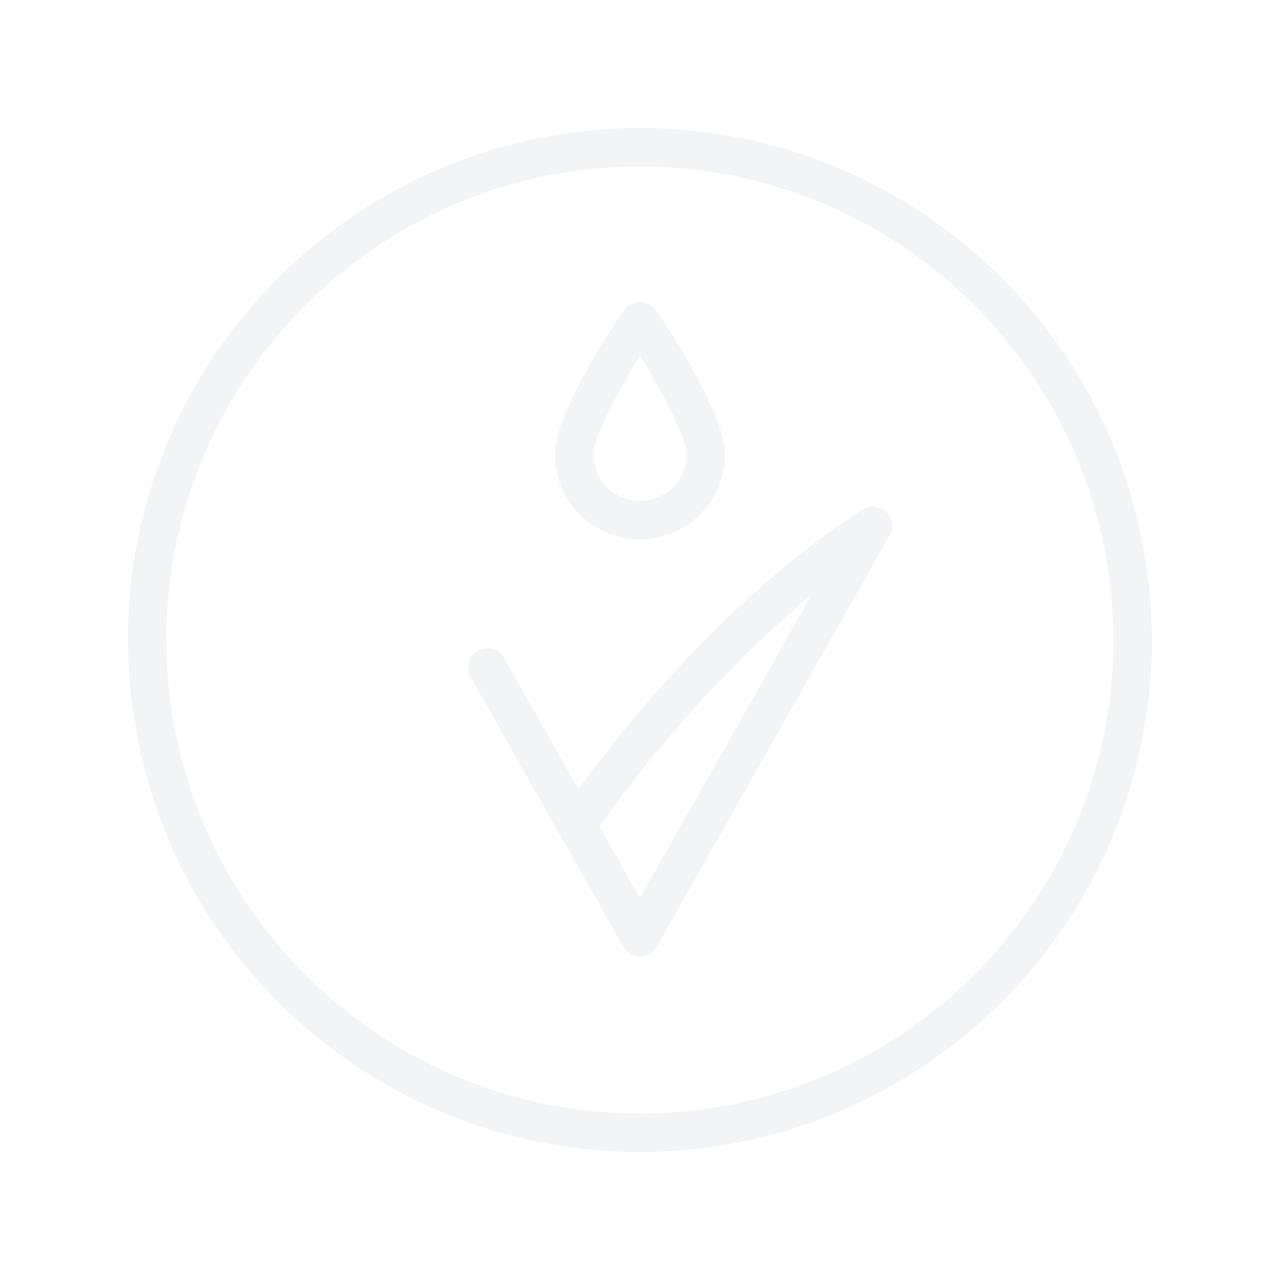 Clarins Instant Light Lip Comfort Oil 7ml